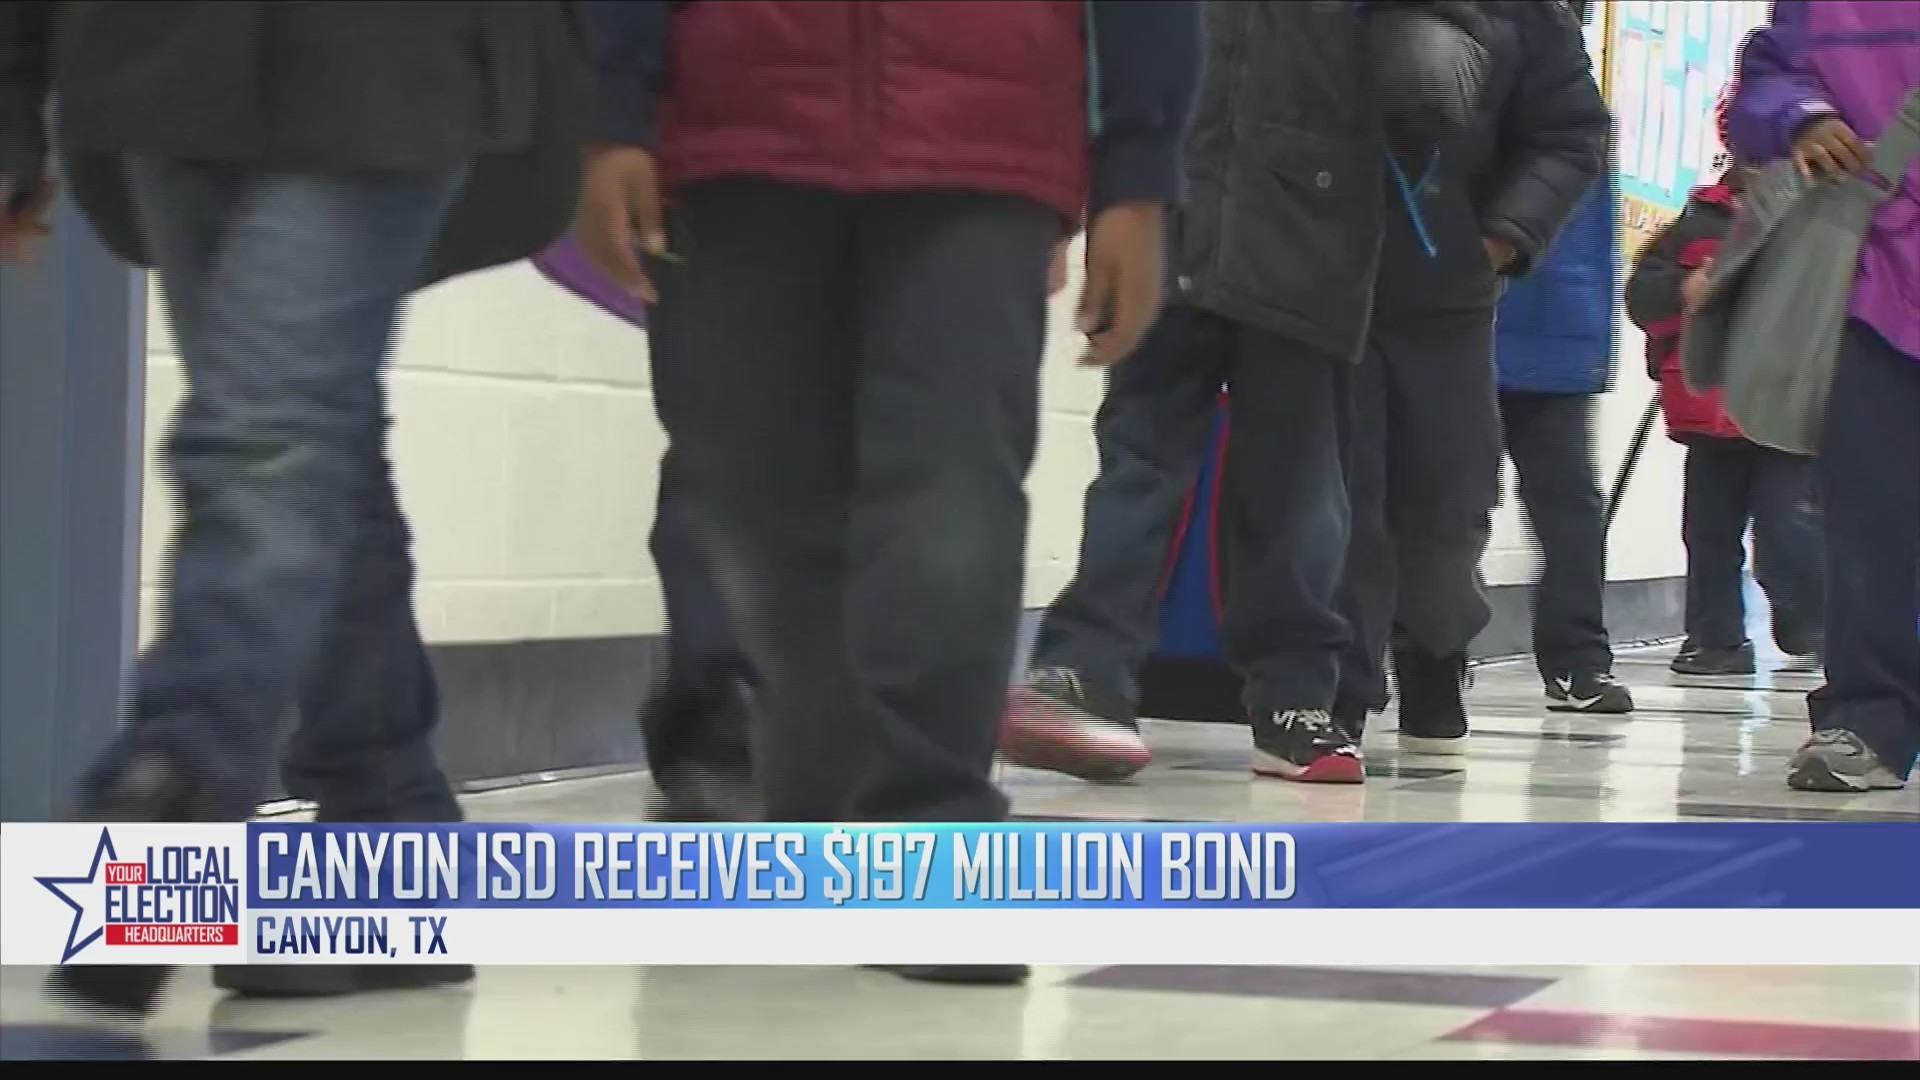 Canyon ISD has Big Plans for $197 Million Bond